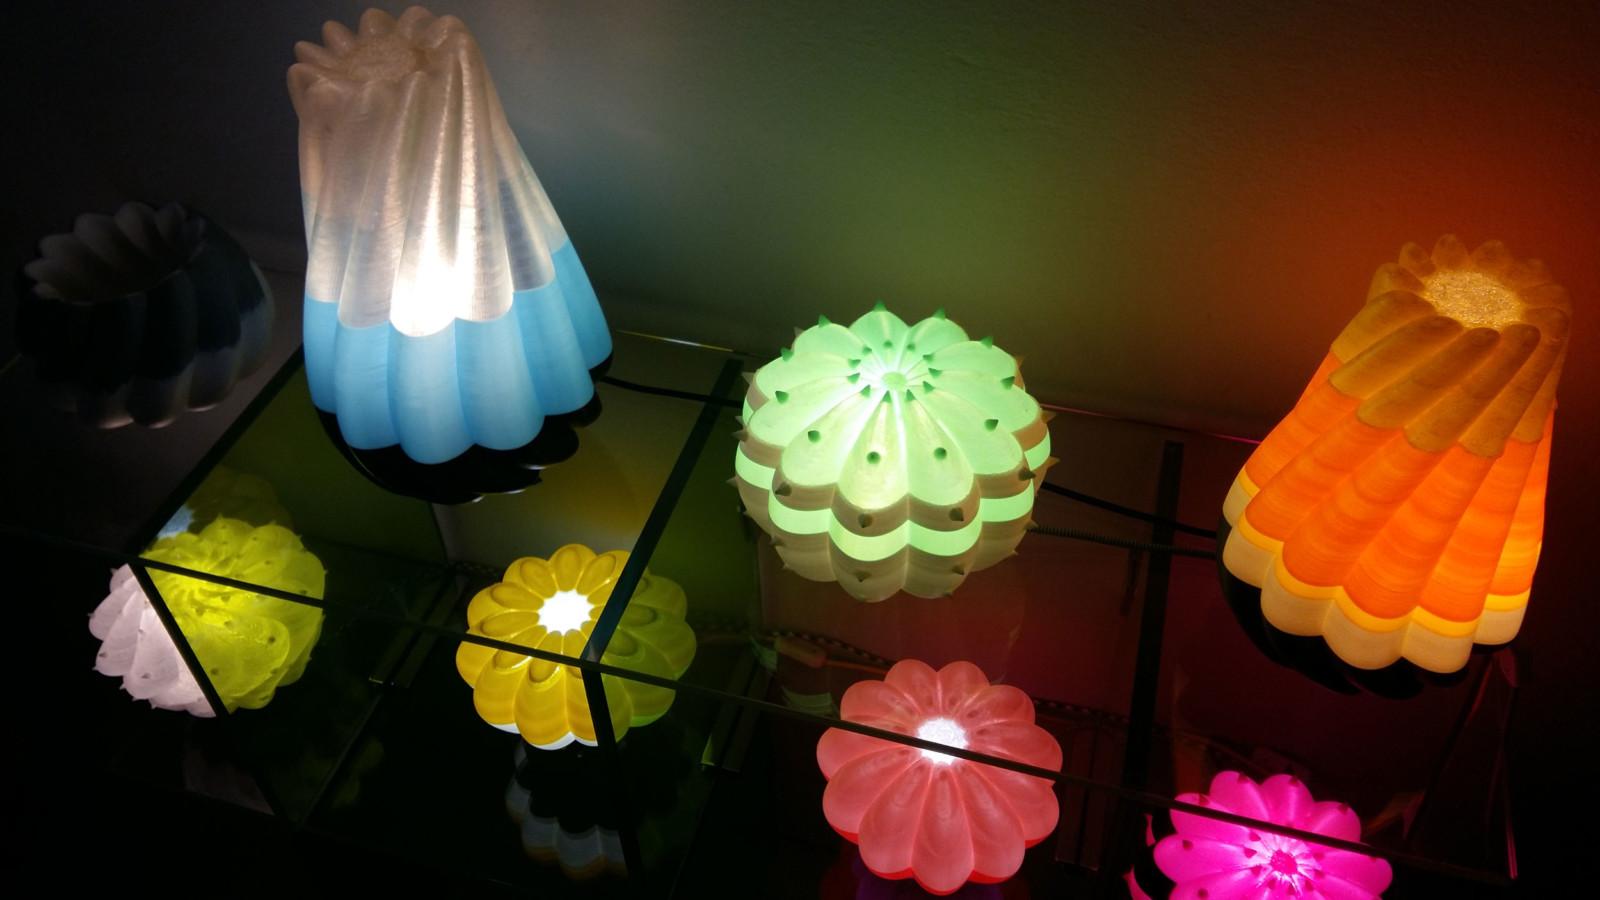 serena-fanara-design-progettazione-stampa-3d-desert-light-artigiana-milano